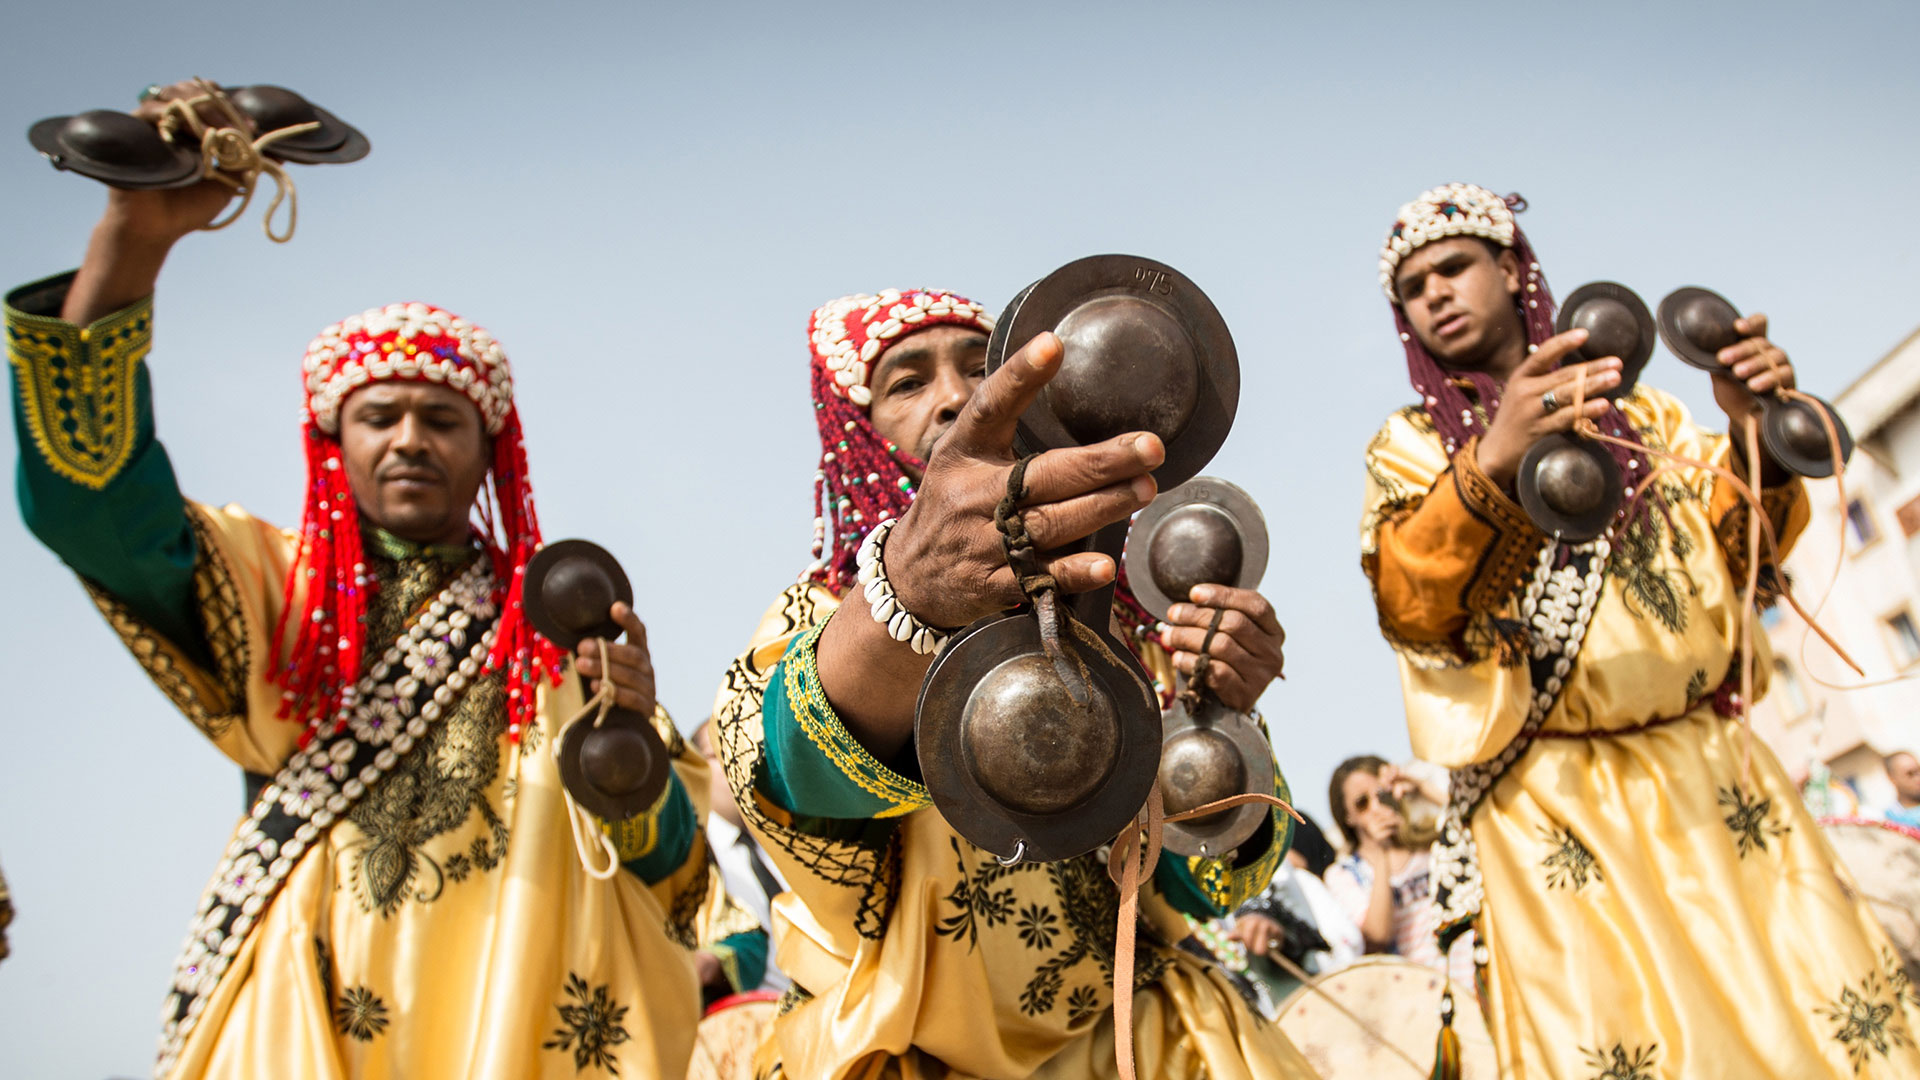 Les musiciens gnawa d'Essaouira